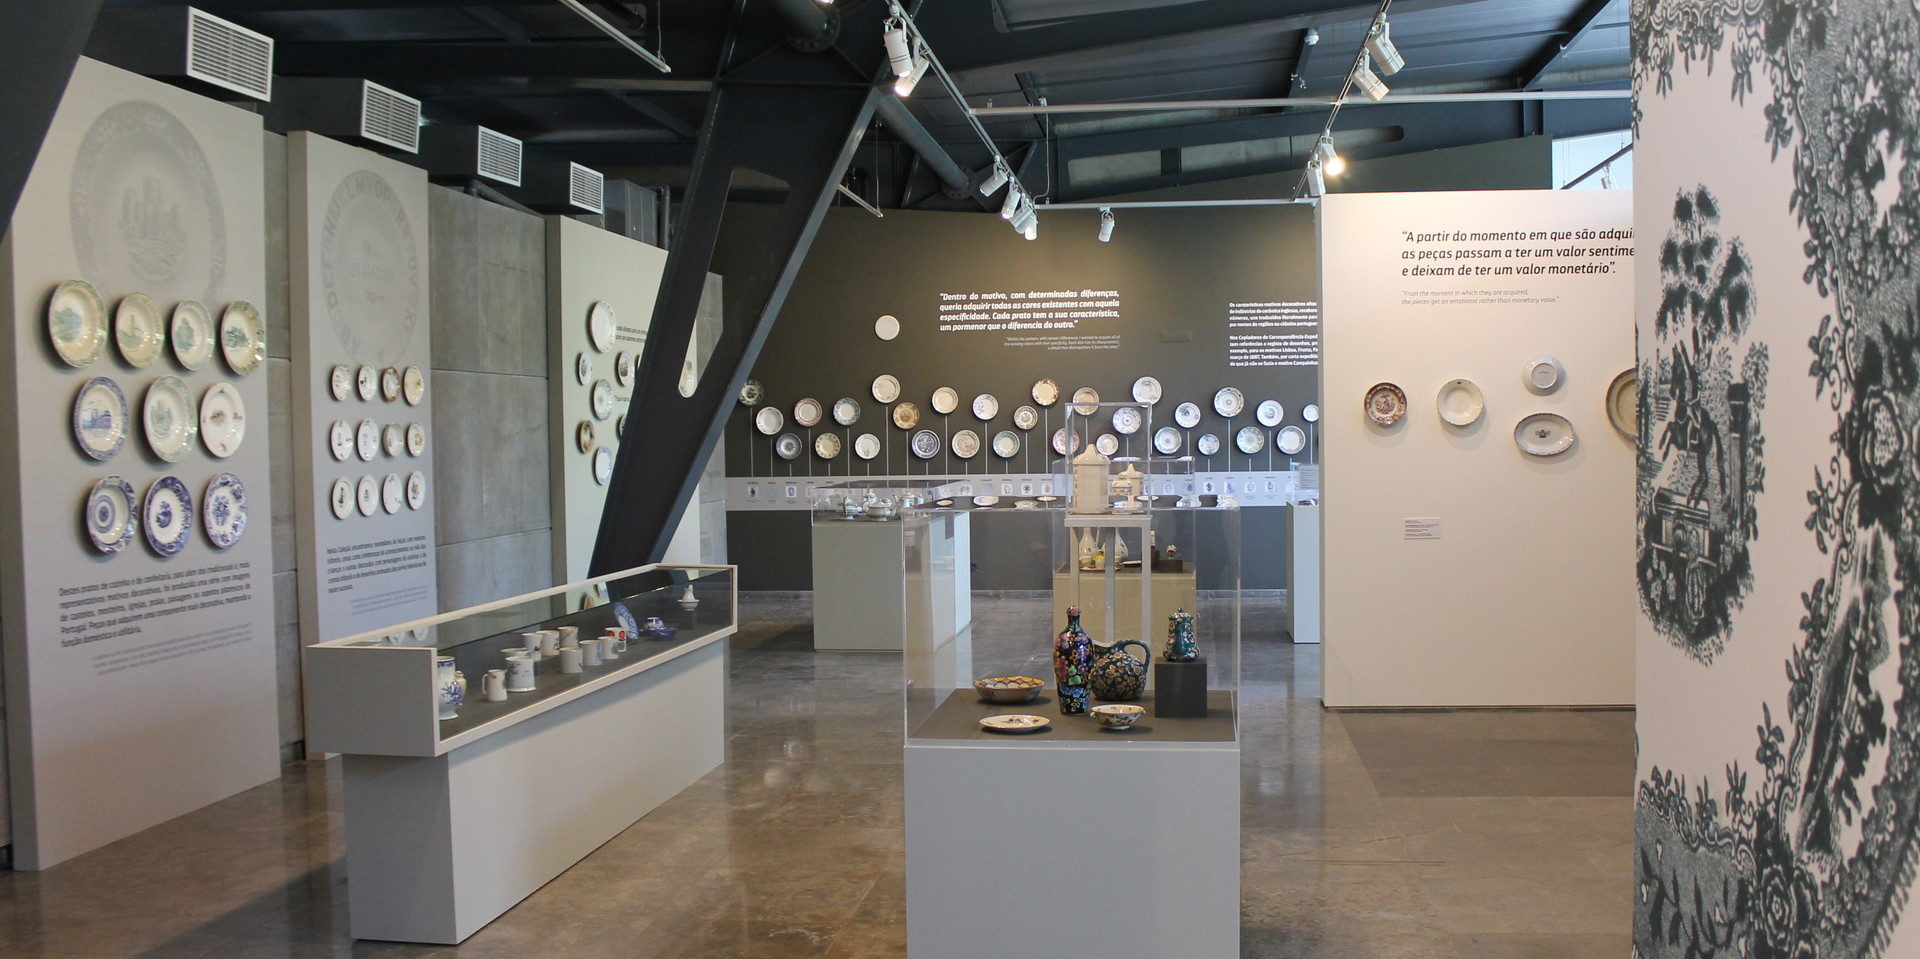 MUSEU DE CERÂMICA SACAVÉM